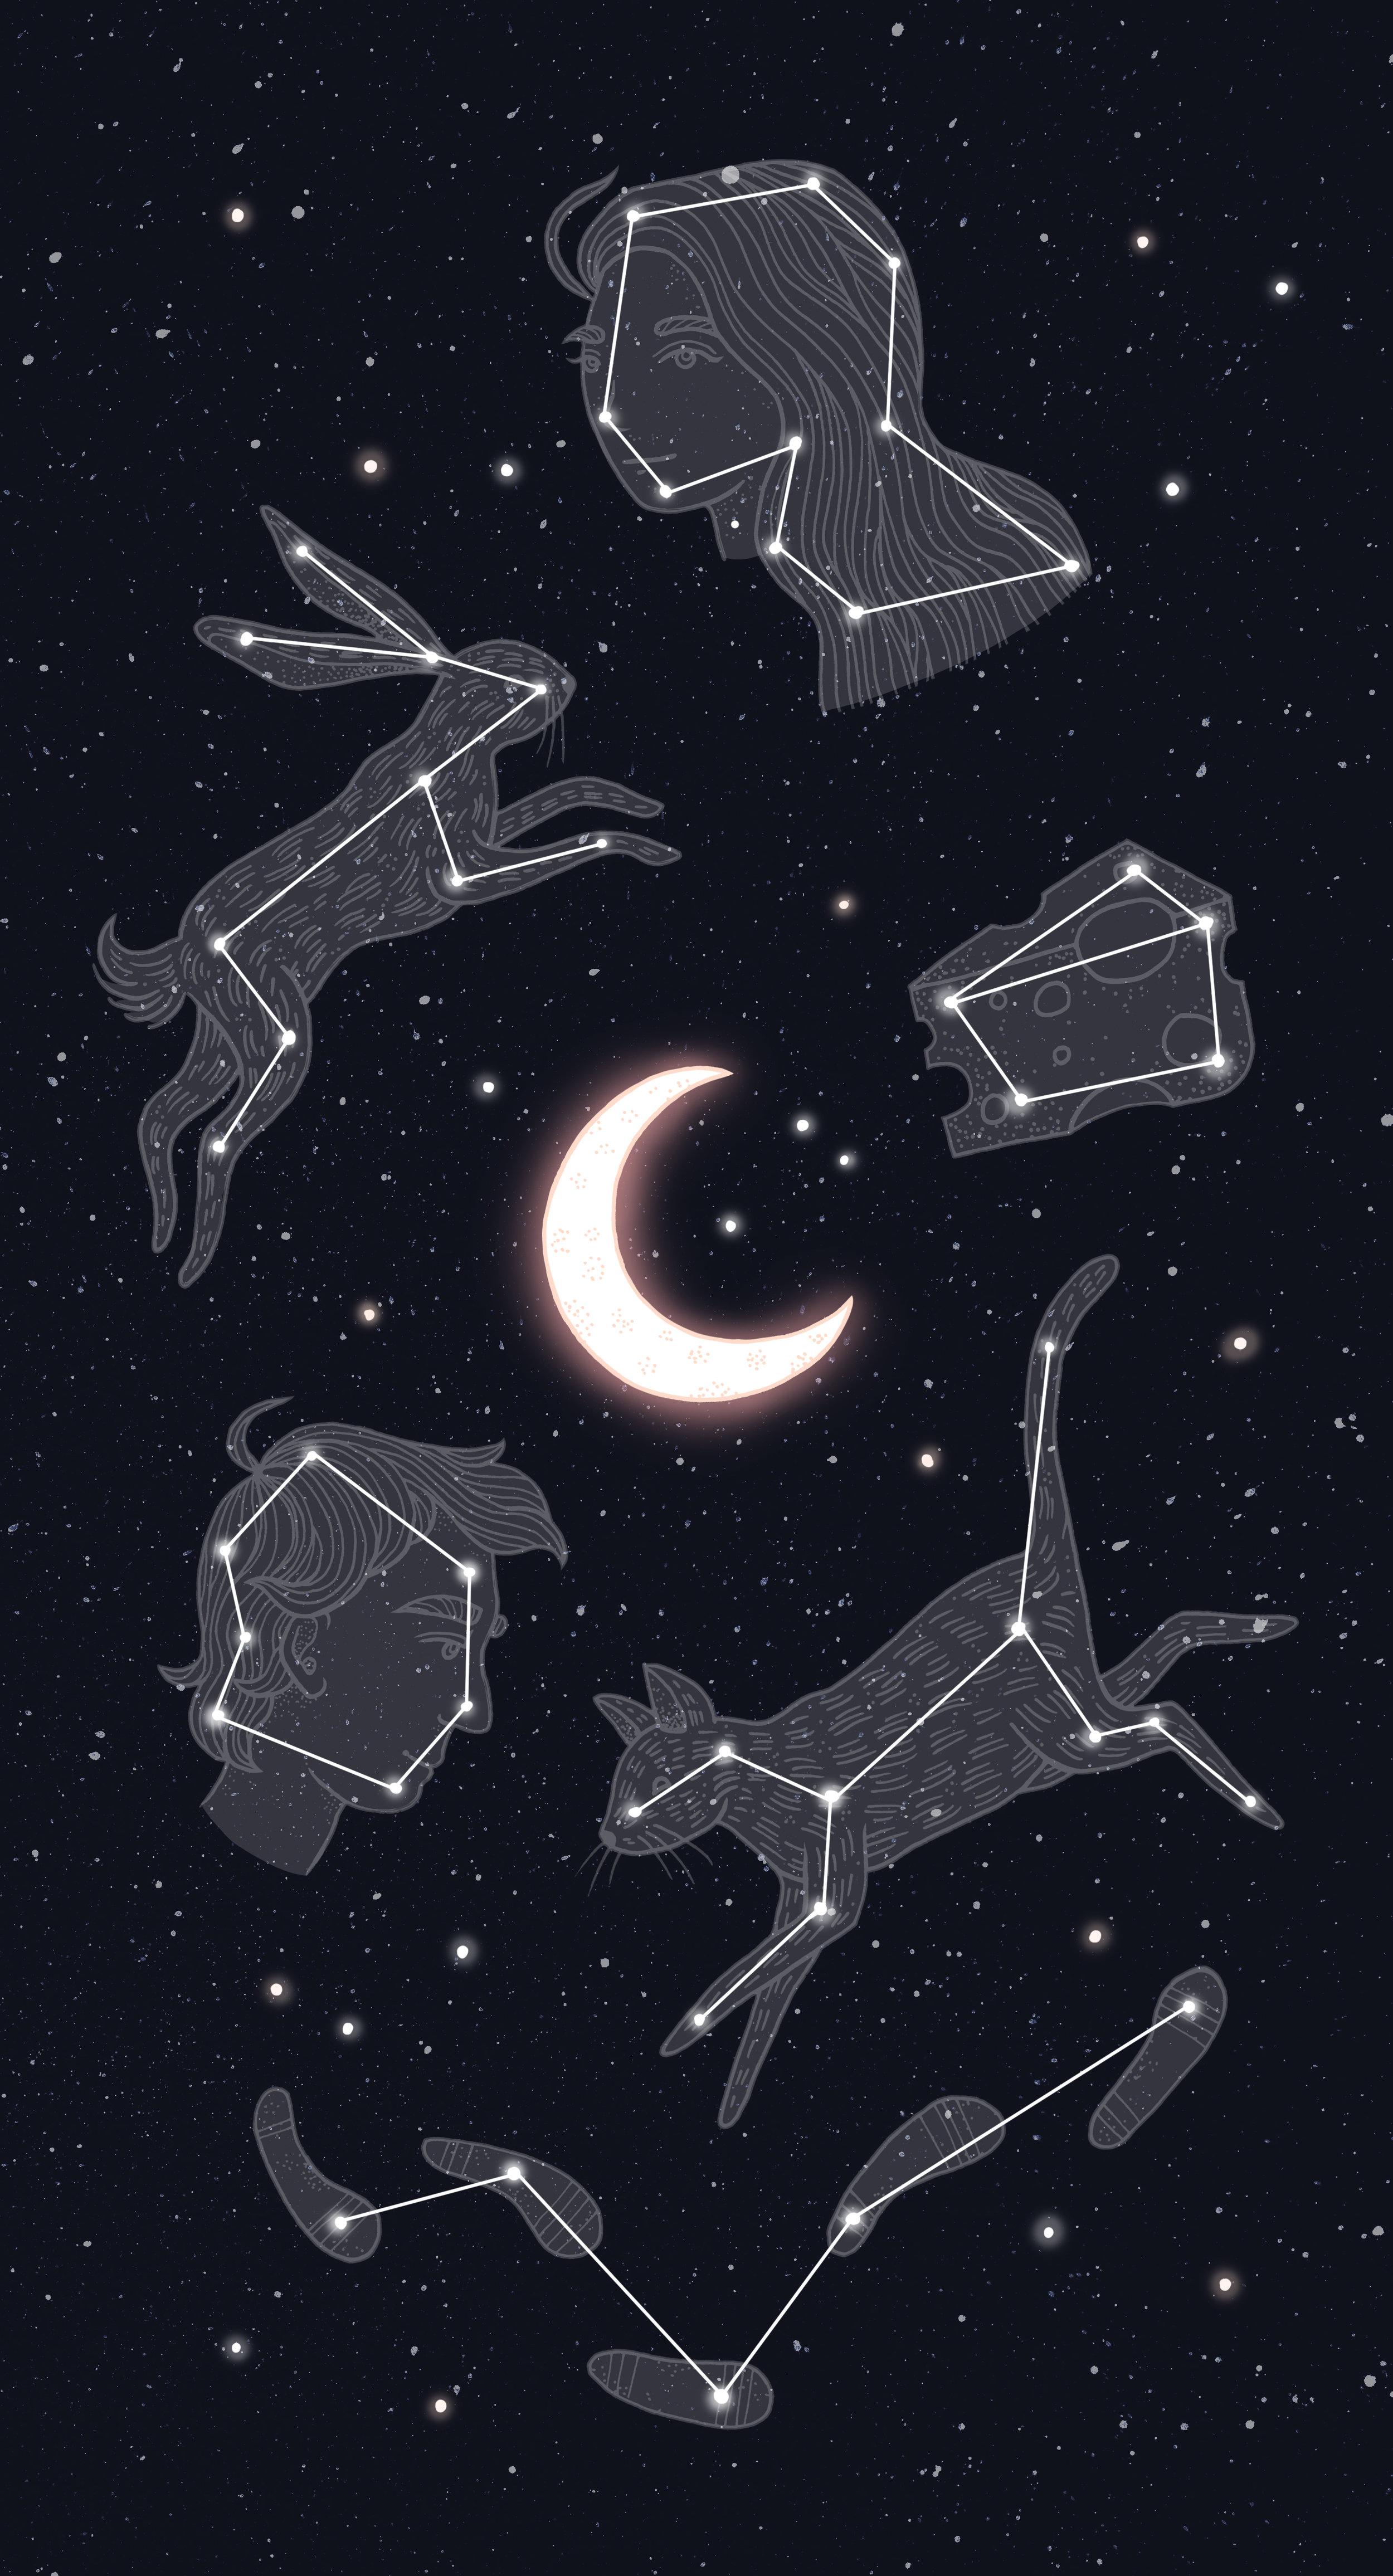 8 - The Moon Is.jpg